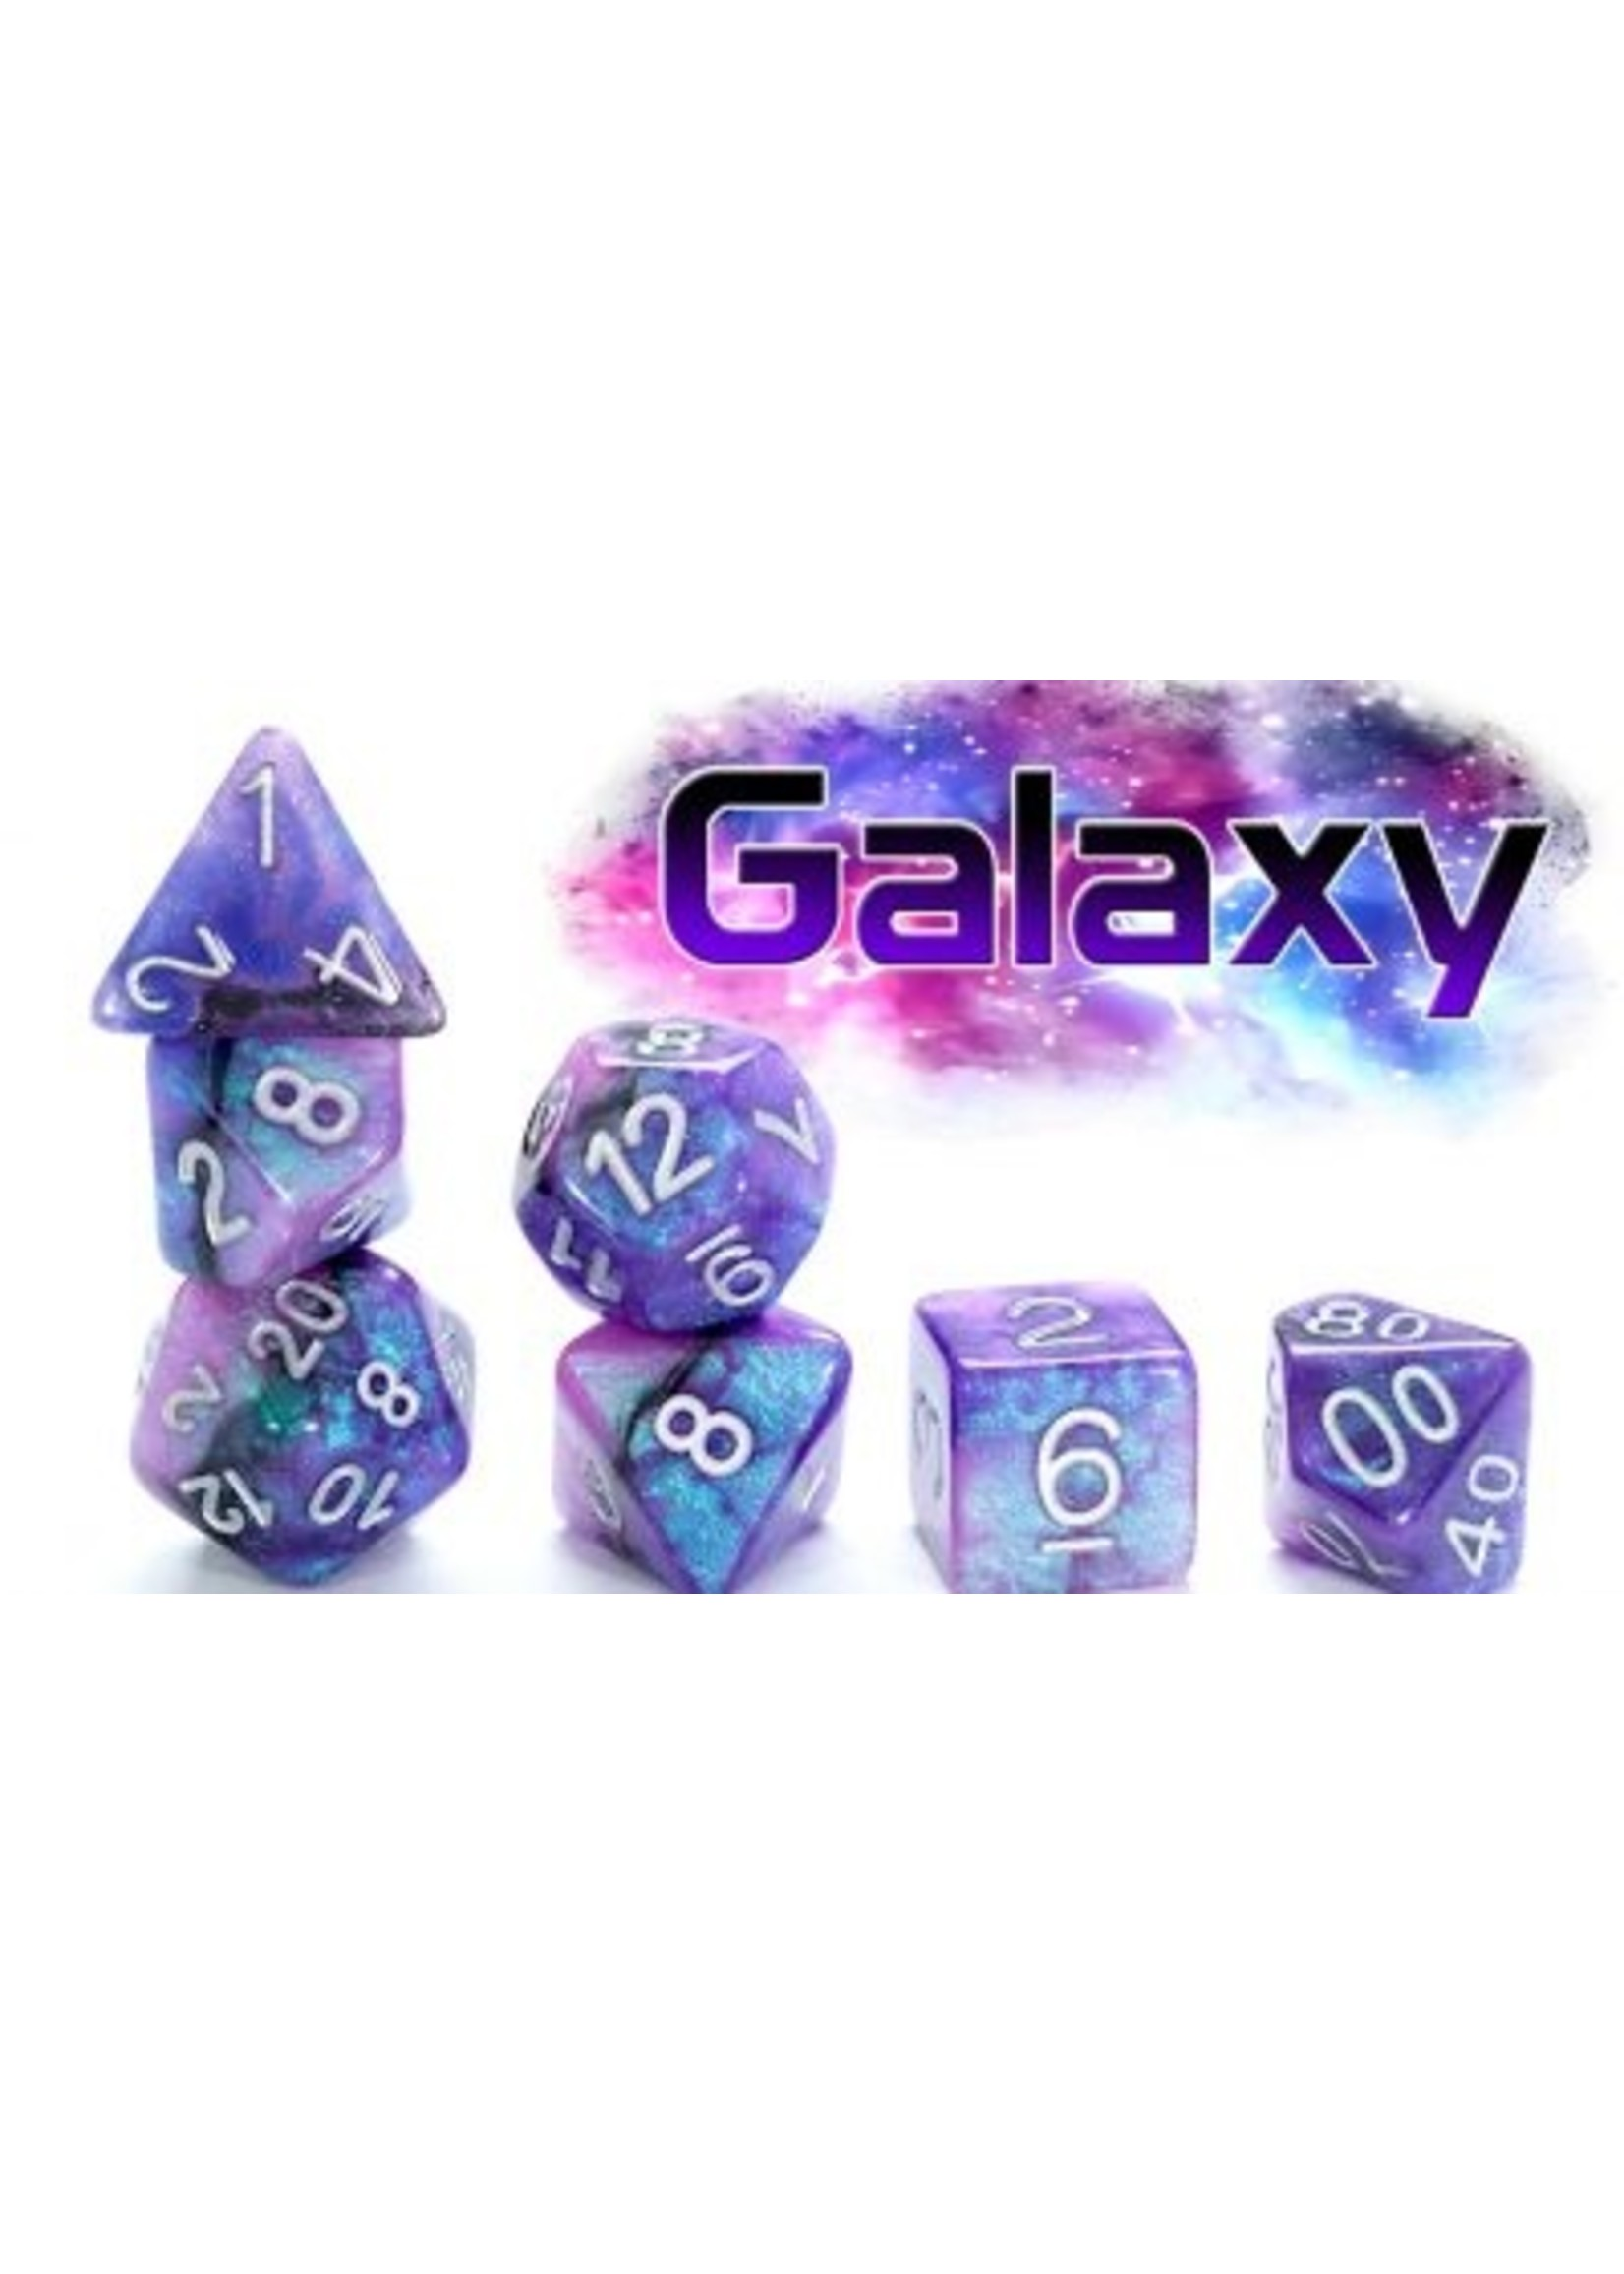 Aether Dice: Galaxy (7 Polyhedral Dice Set)